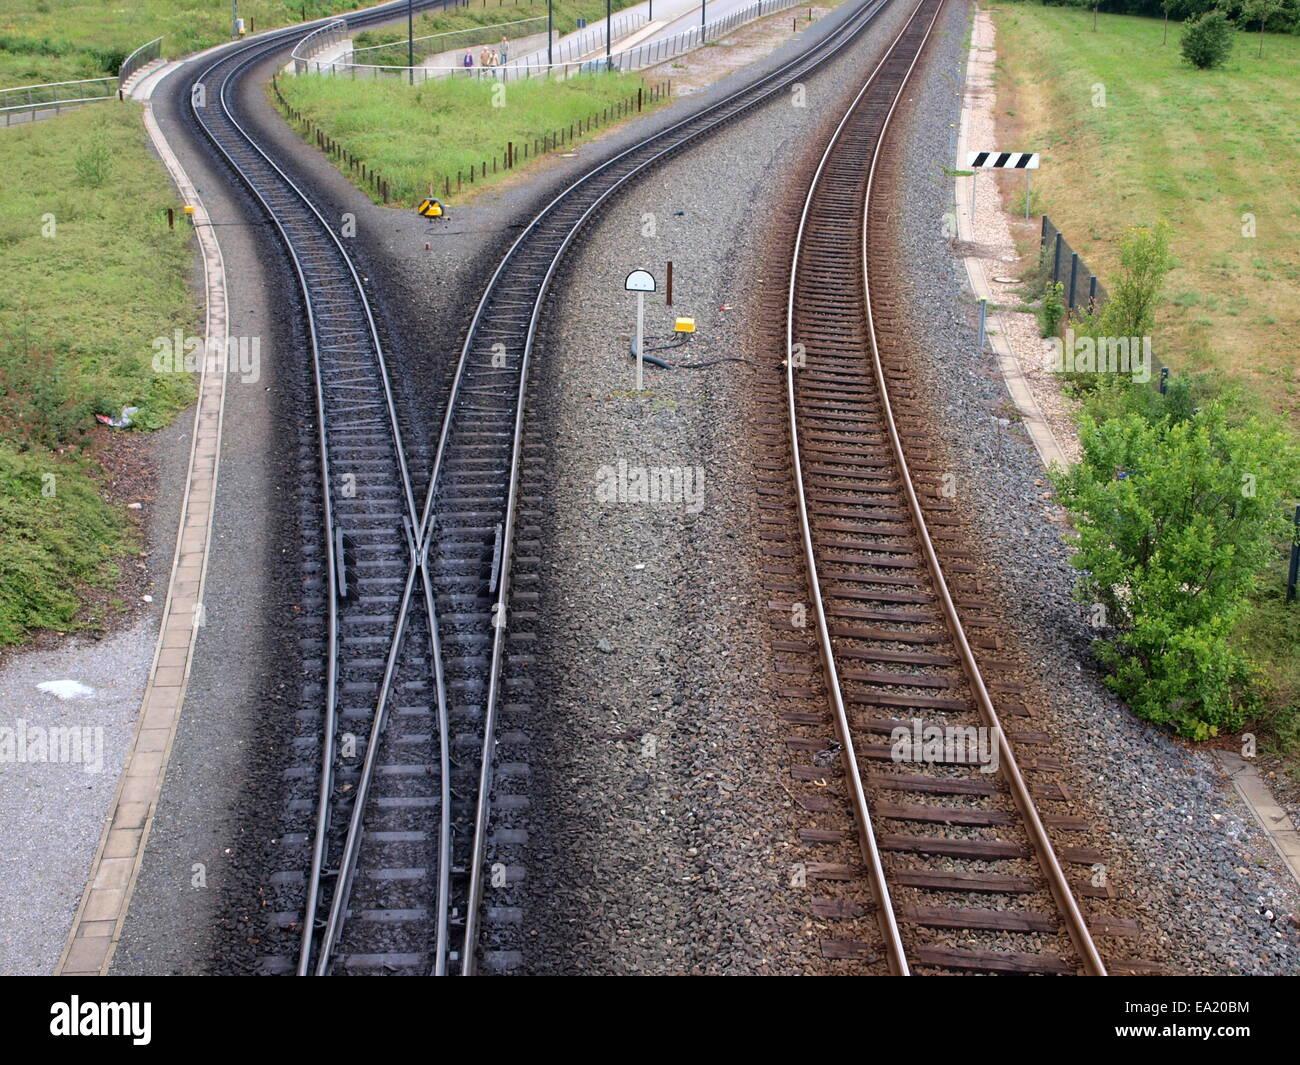 narrow gauge and standard gauge rails stock photo 75032264 alamy